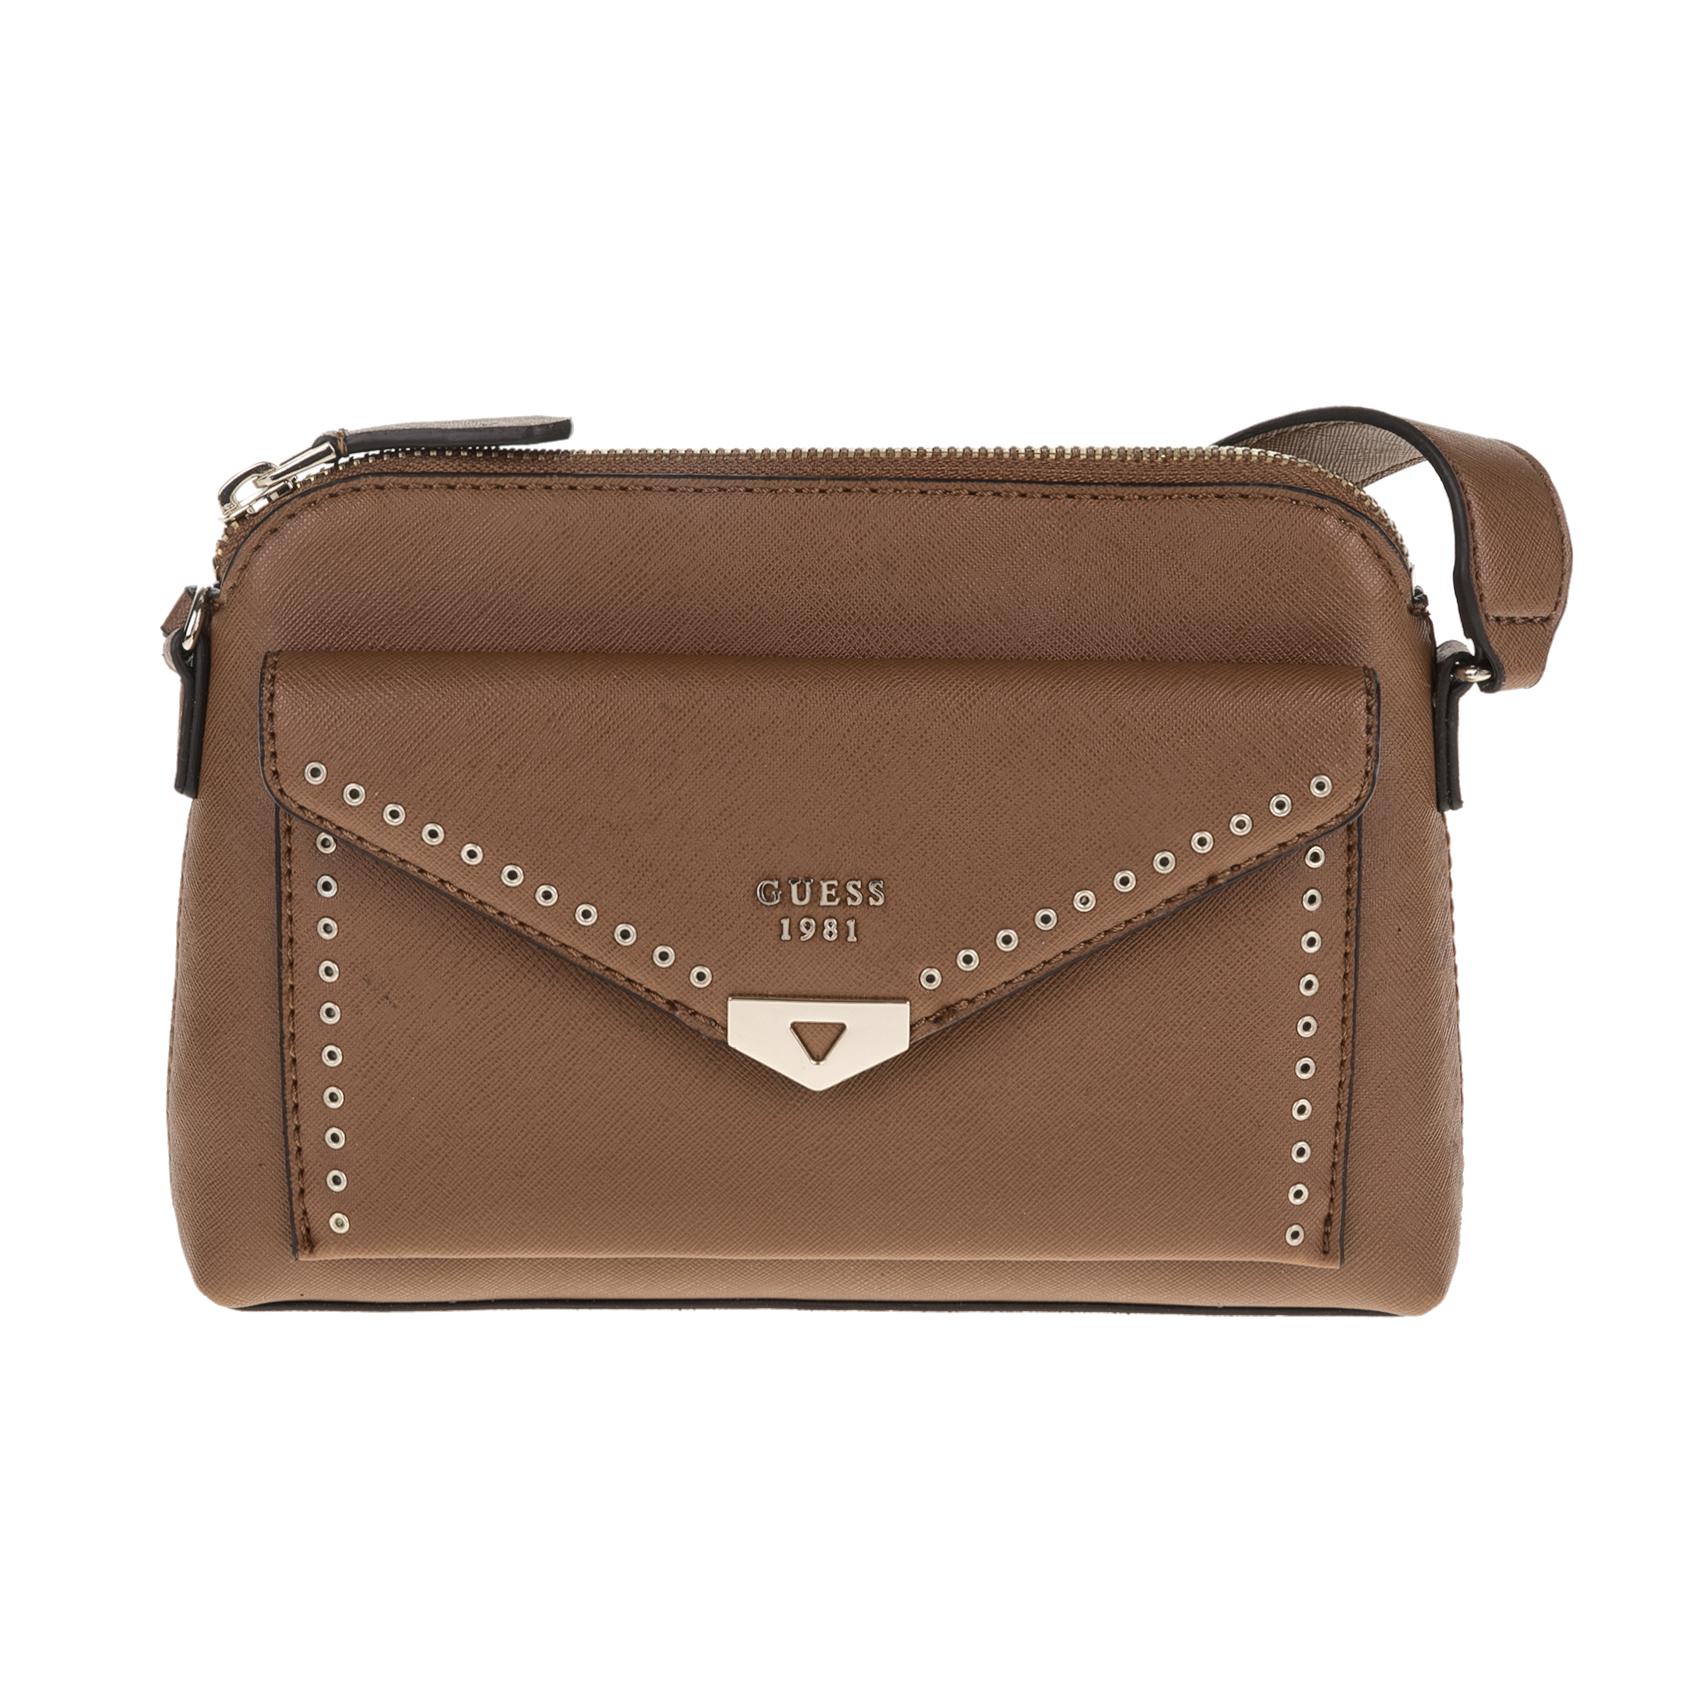 GUESS – Γυναικεία τσάντα ώμου Guess LOTTIE CROSSBODY MESSENGER καφέ